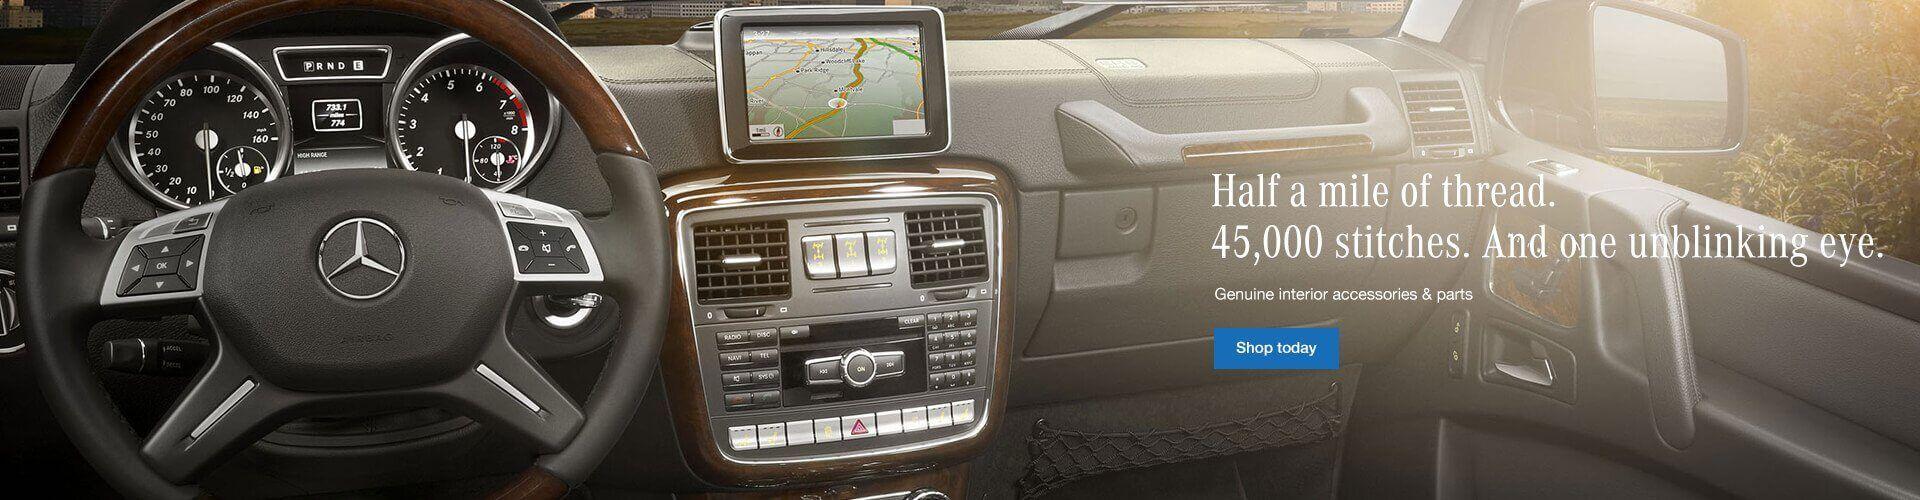 Genuine Mercedes-Benz Interior Accessories and Parts